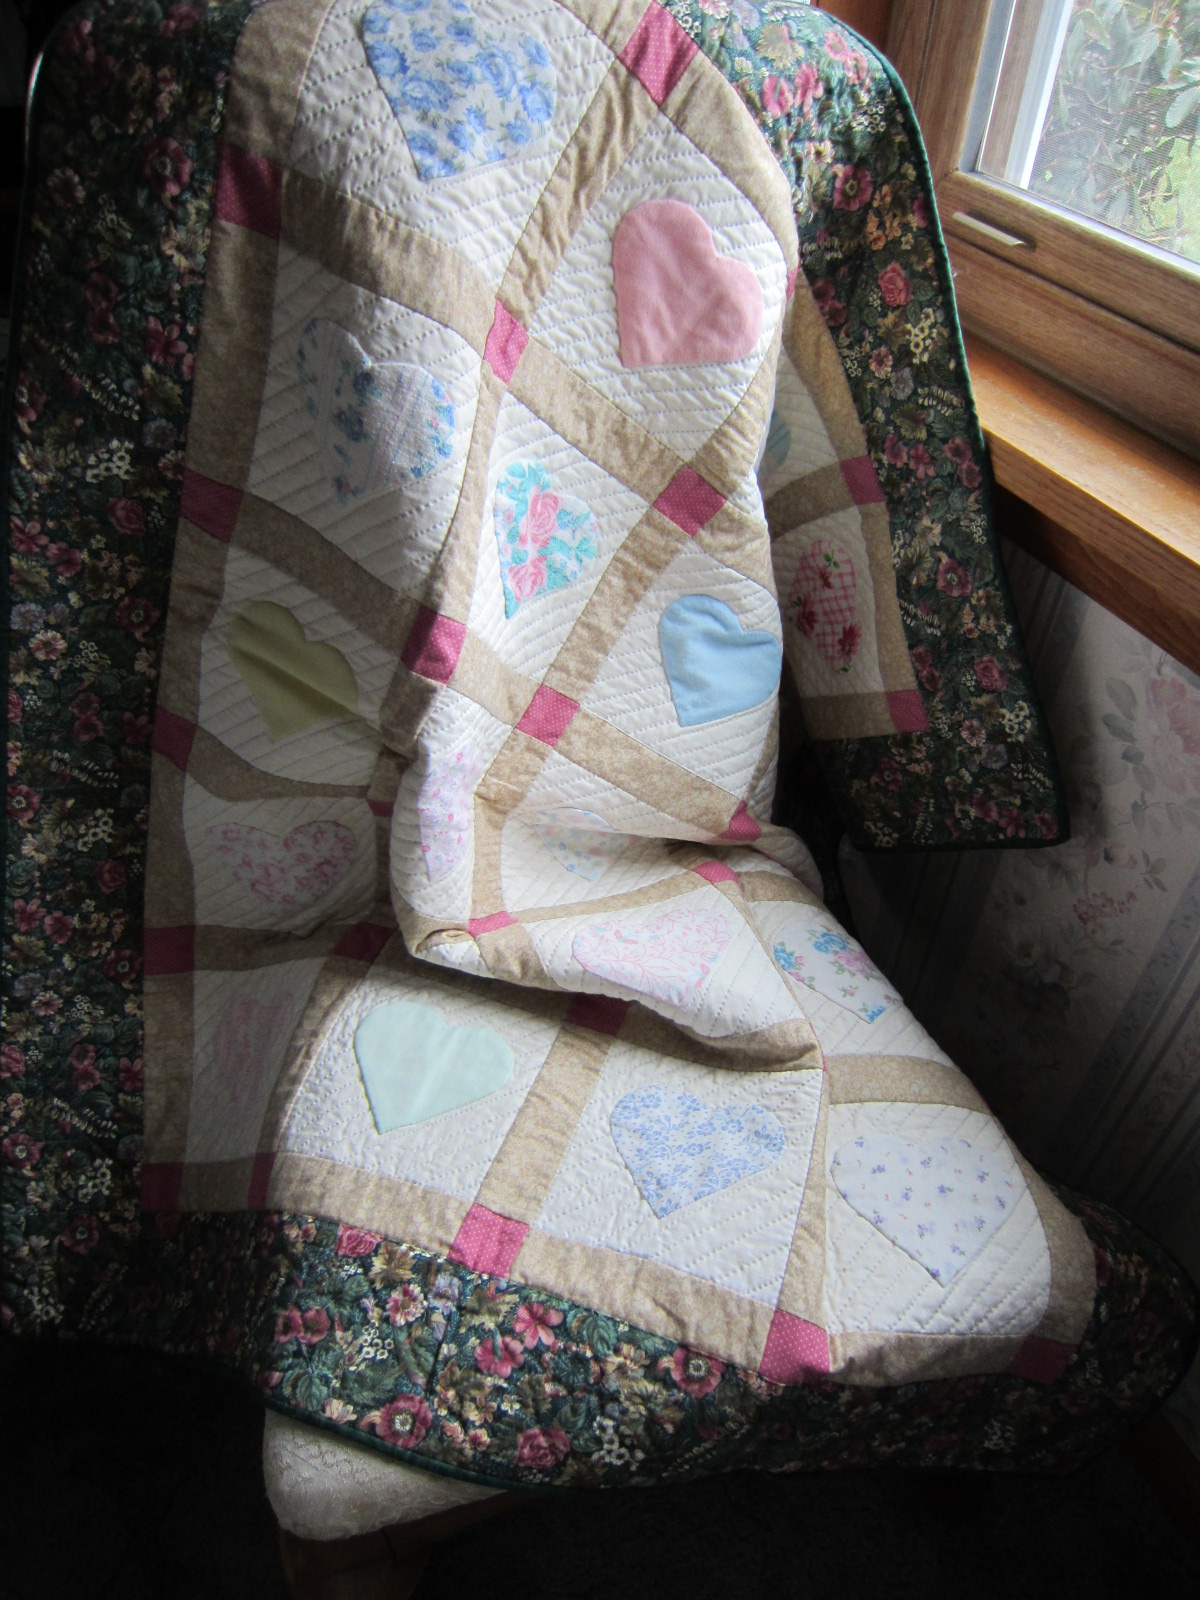 Memory quilt near window